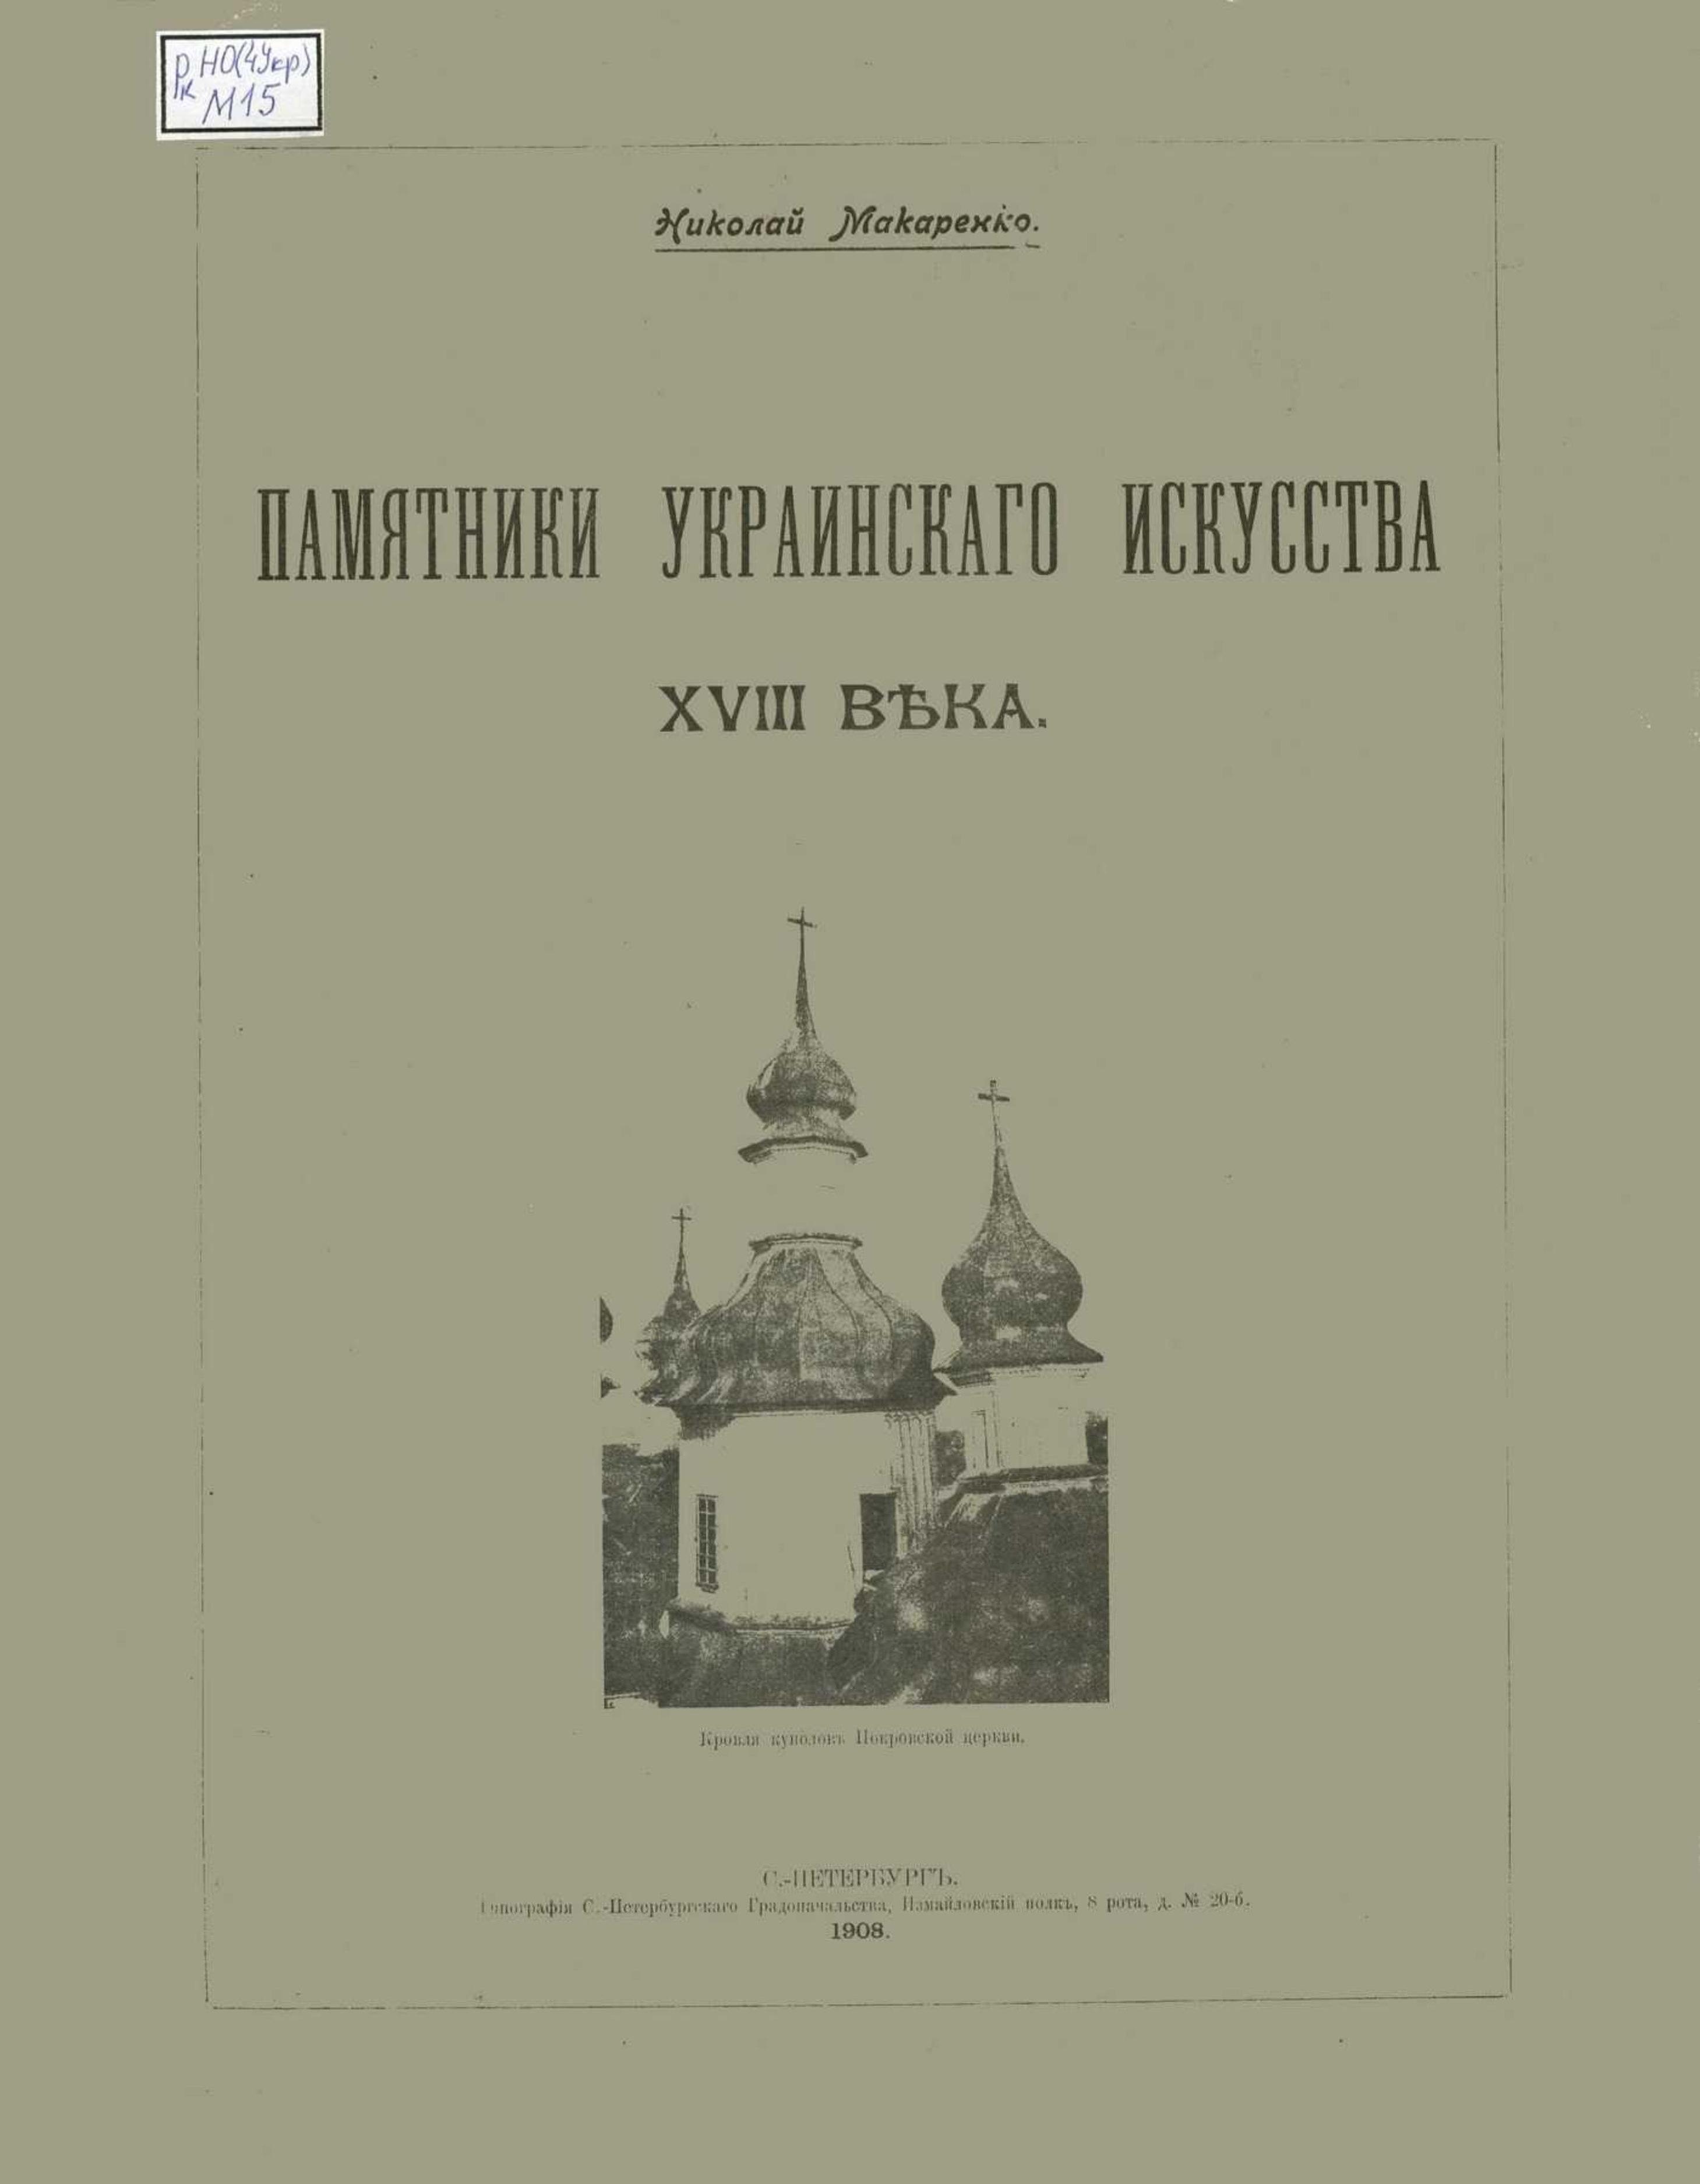 File Monuments Of Ukrainian Art Of The 18th Century Wdl10017 Pdf